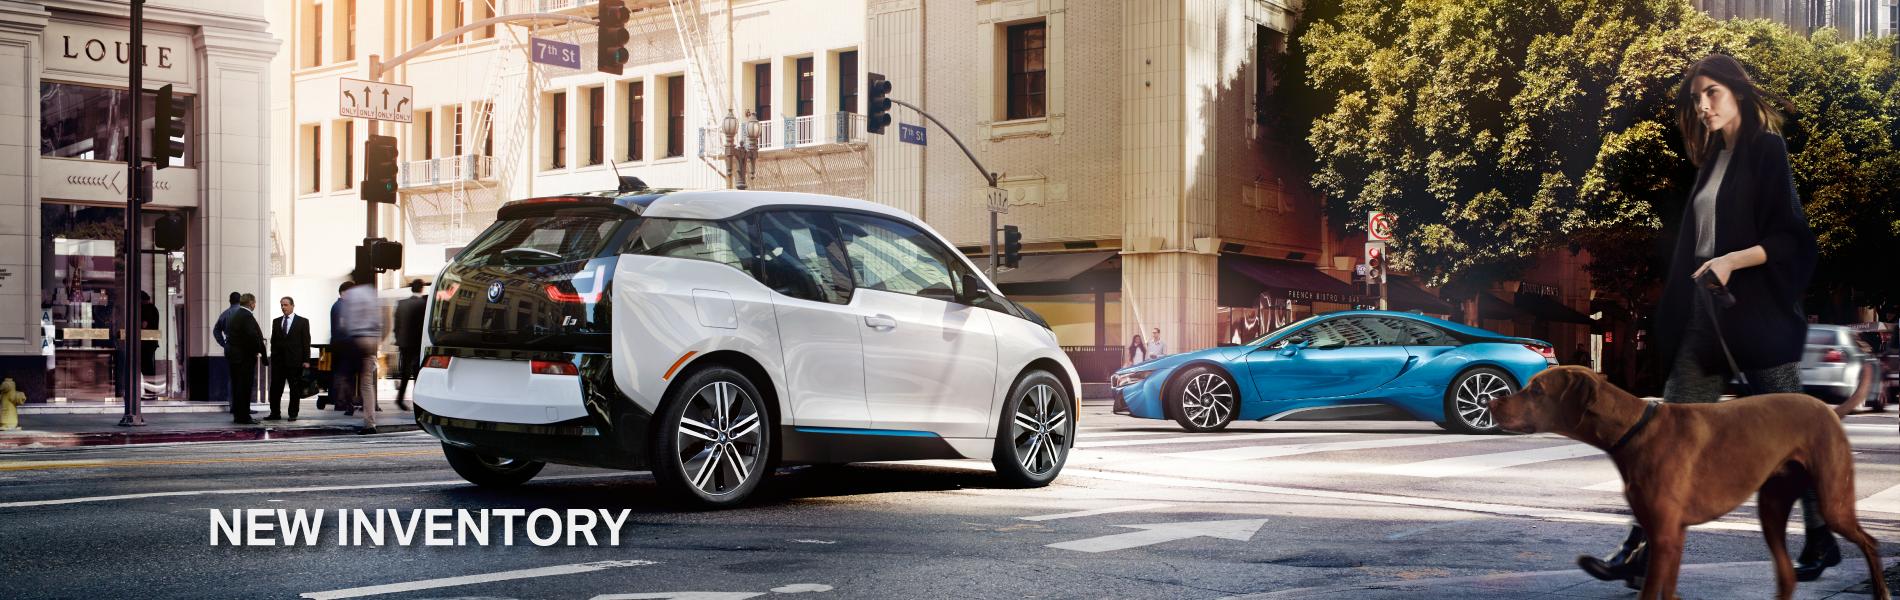 New BMW Inventory